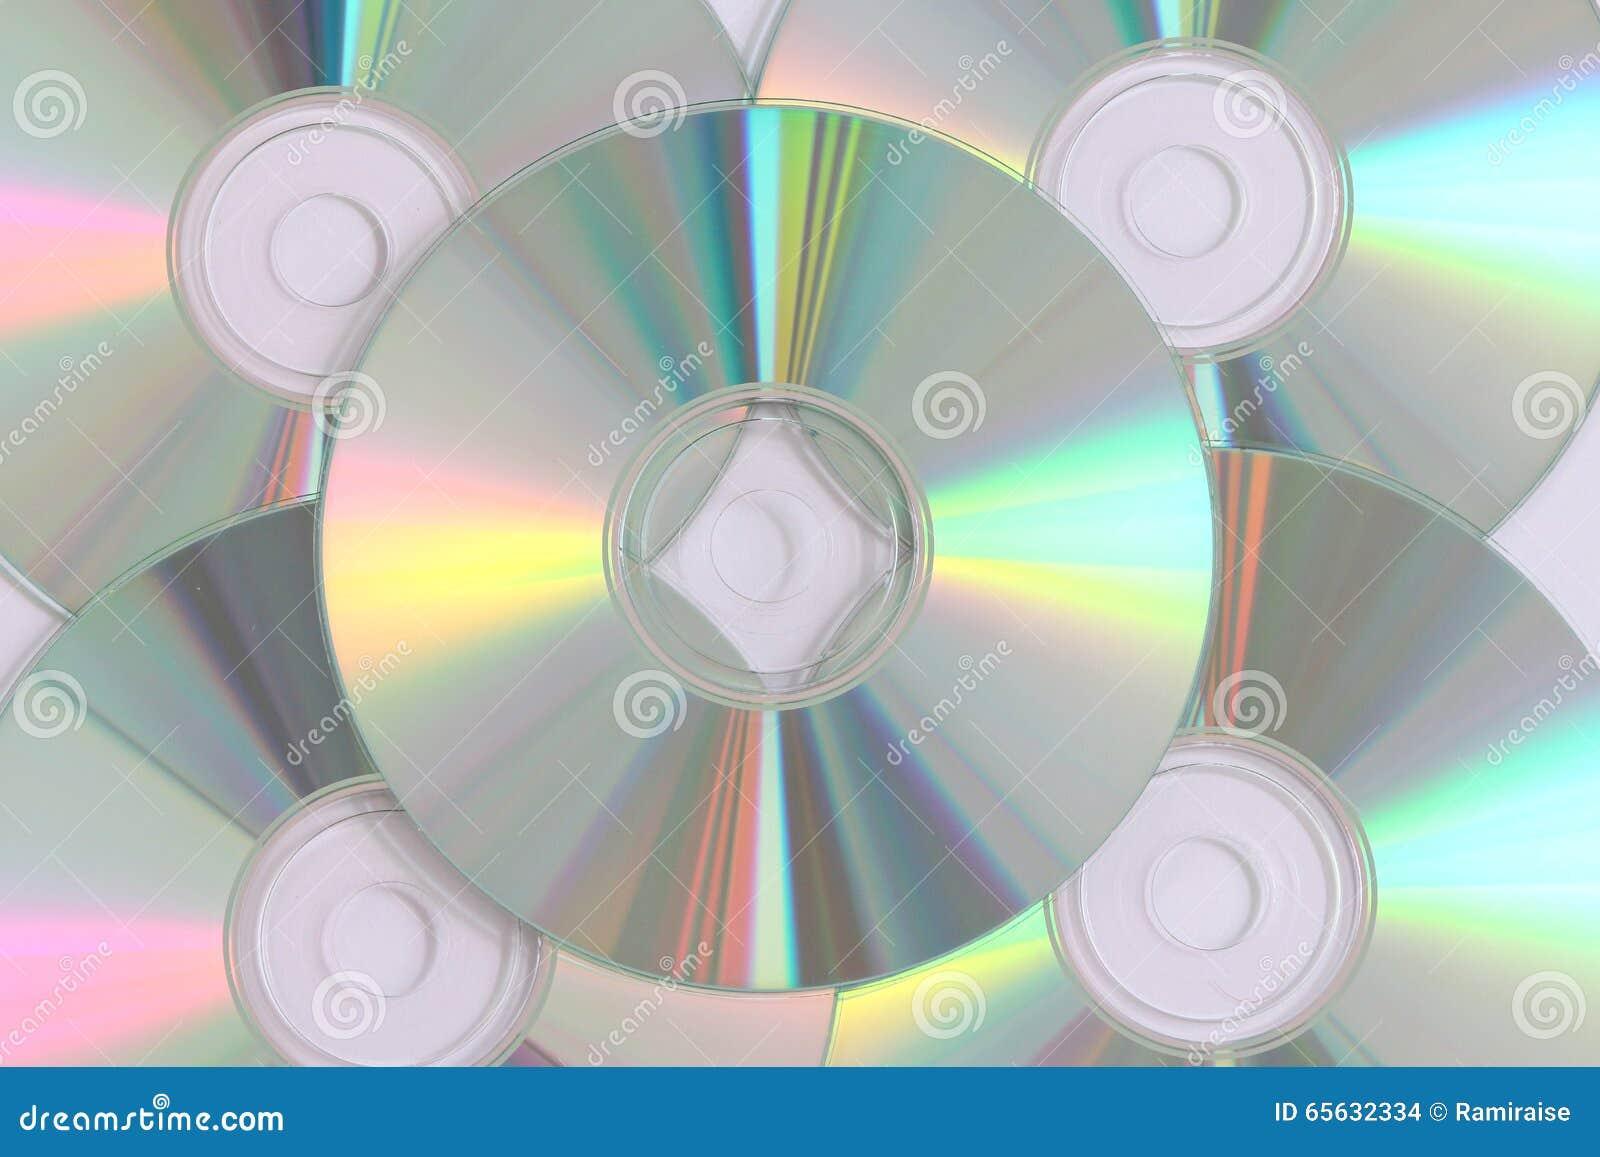 CD gegevensopname